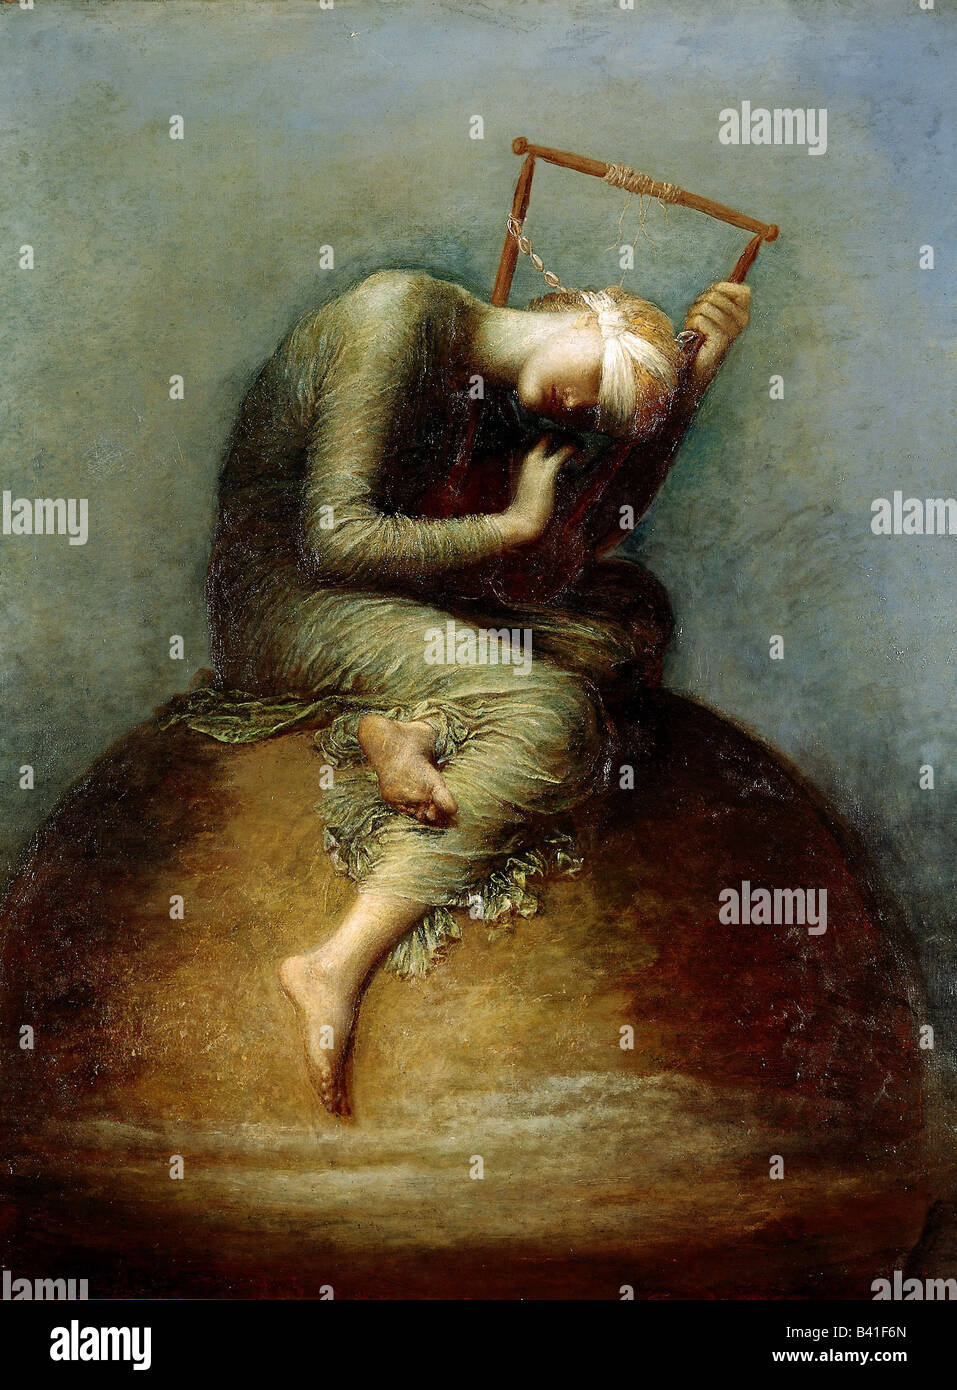 Fine Arts - Watt, George Frederic (1817-1904), Malerei, 'Hope', 1885, Öl auf Leinwand, 141 x 110 cm, Stockbild